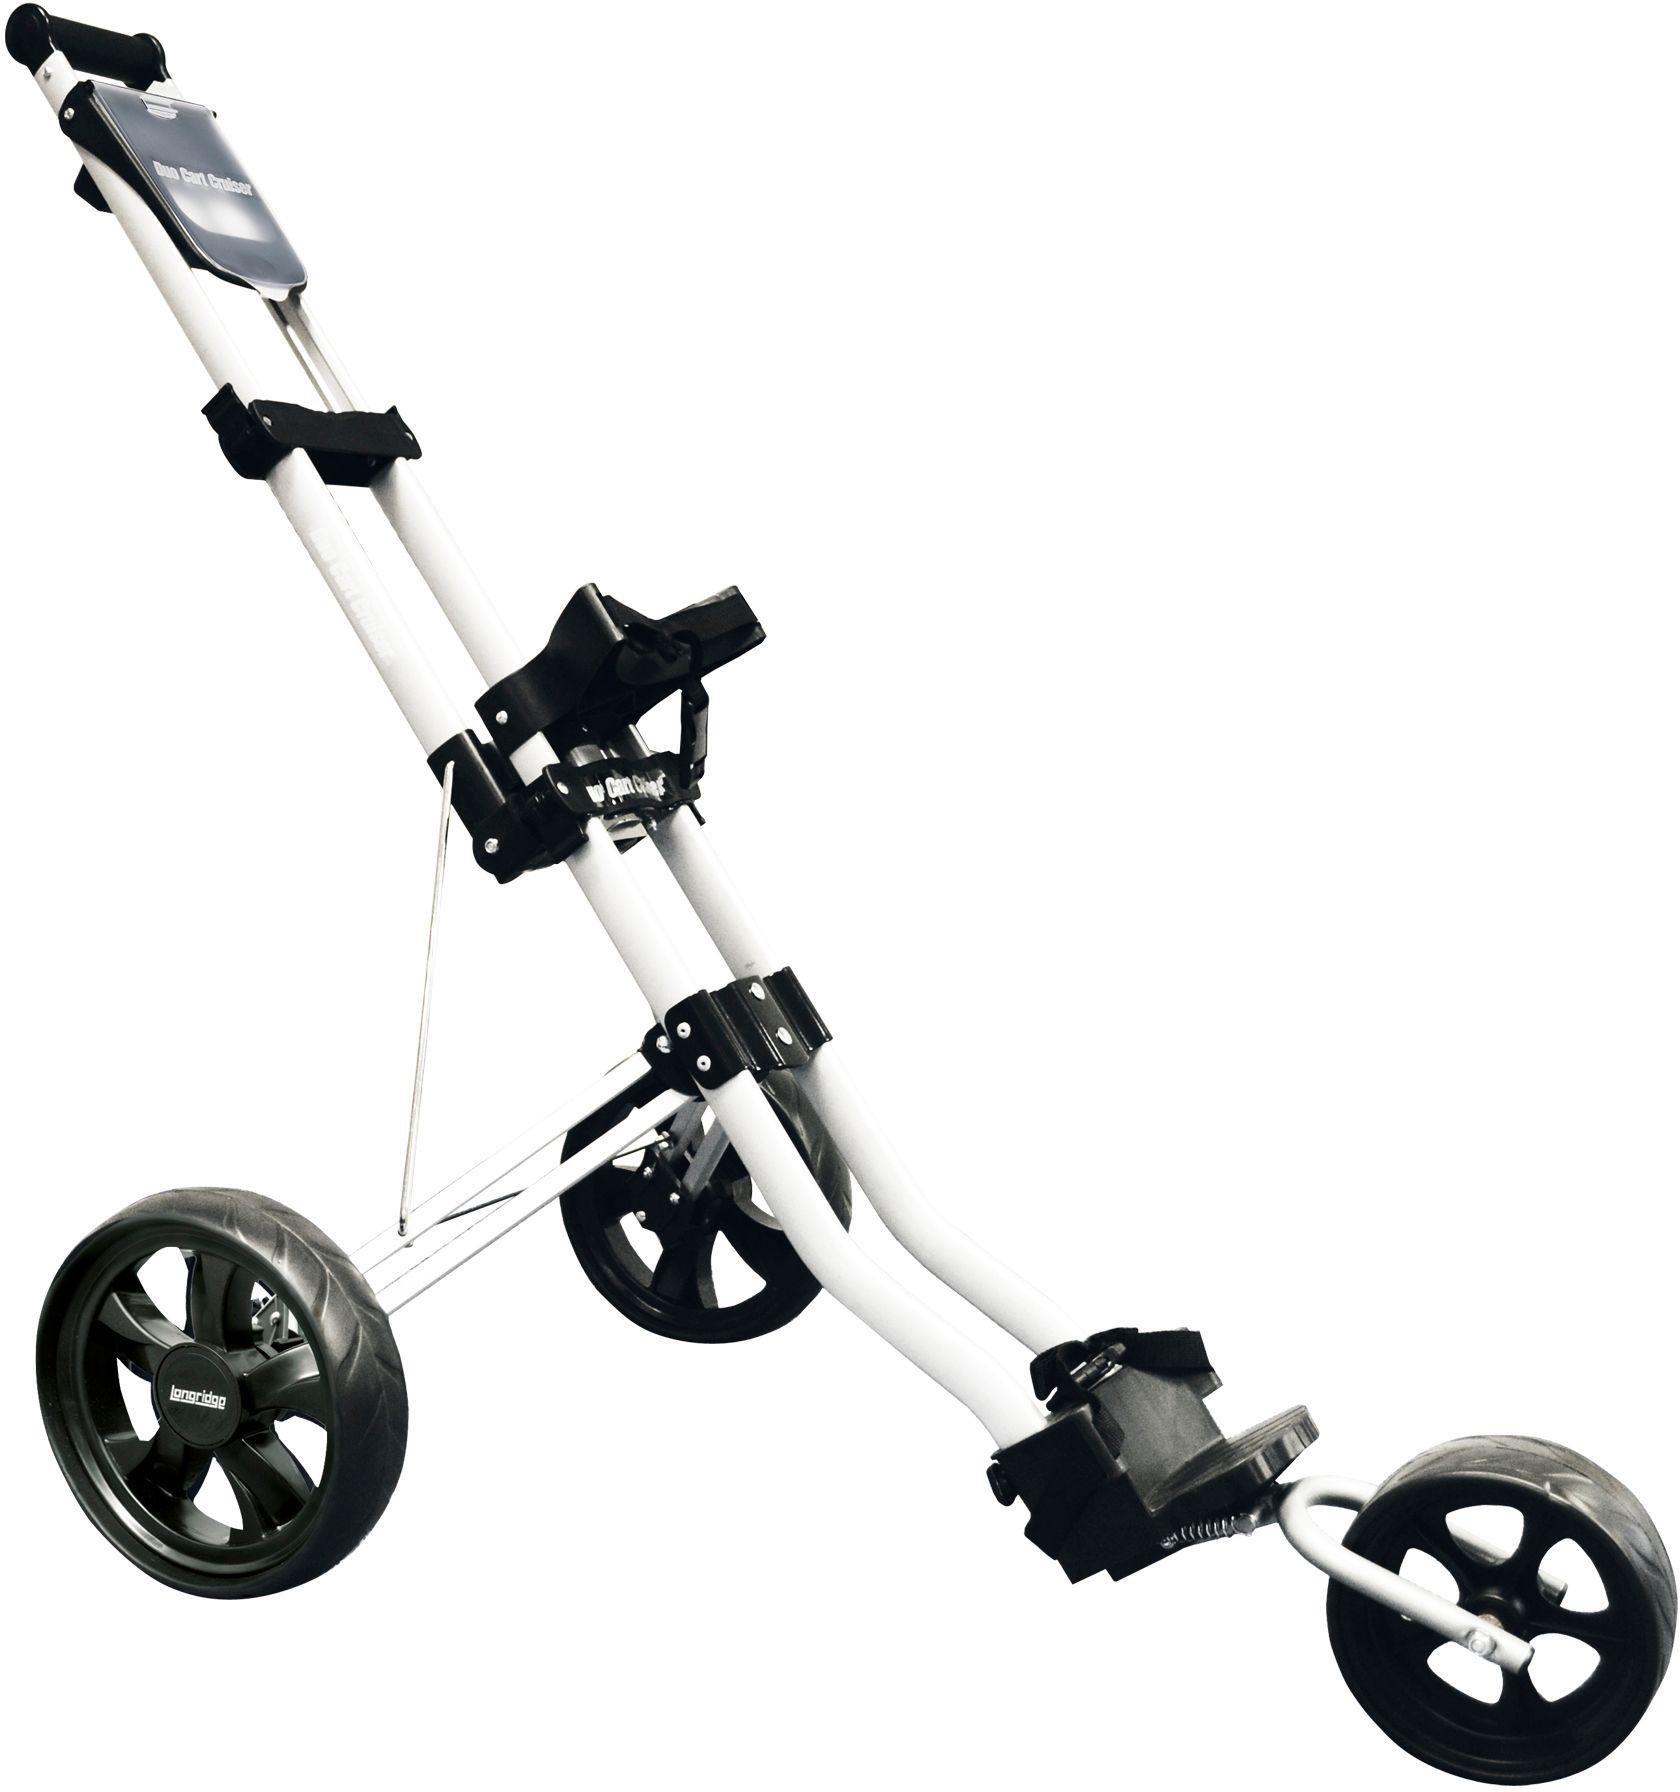 Longridge 3 Wheel Duo Cart Cruiser Golf Trolley - Silver.